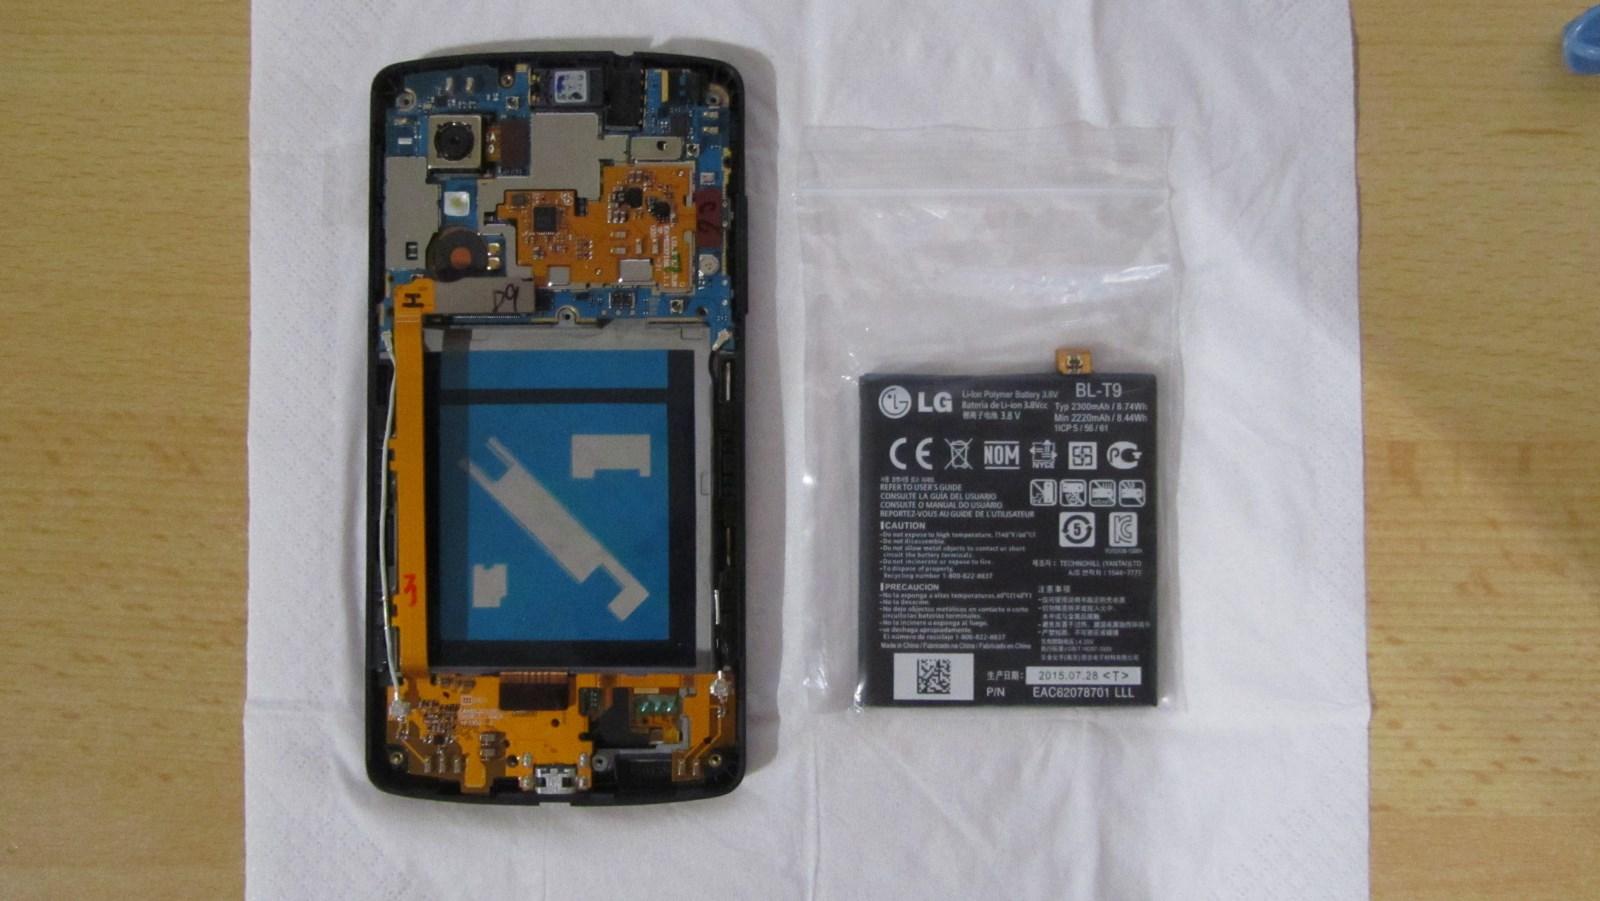 new_battery.jpg.b8e0fb3acfdb7795dacc5f0ca94b80f5.jpg